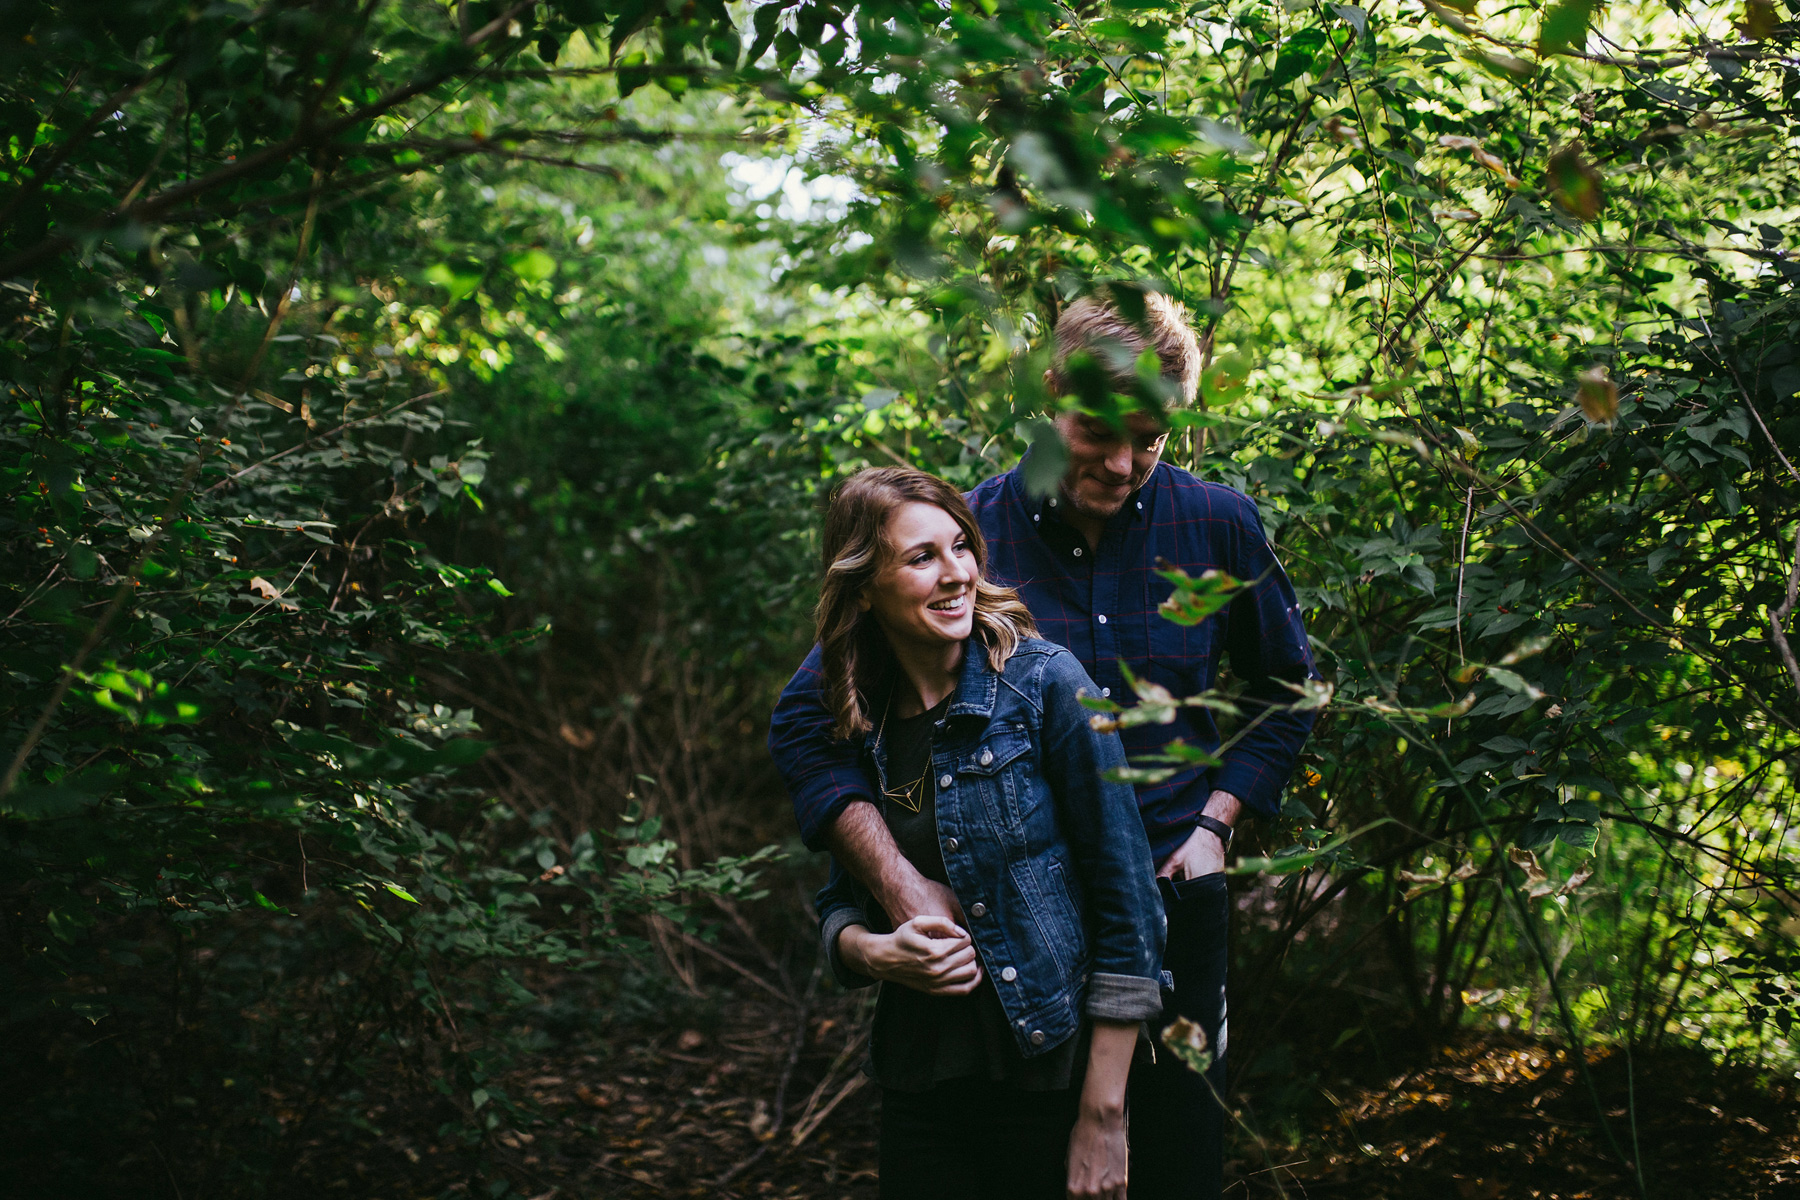 Capen Park Riverside Forest Engagement Photos_Kindling Wedding Photography Blog08.JPG